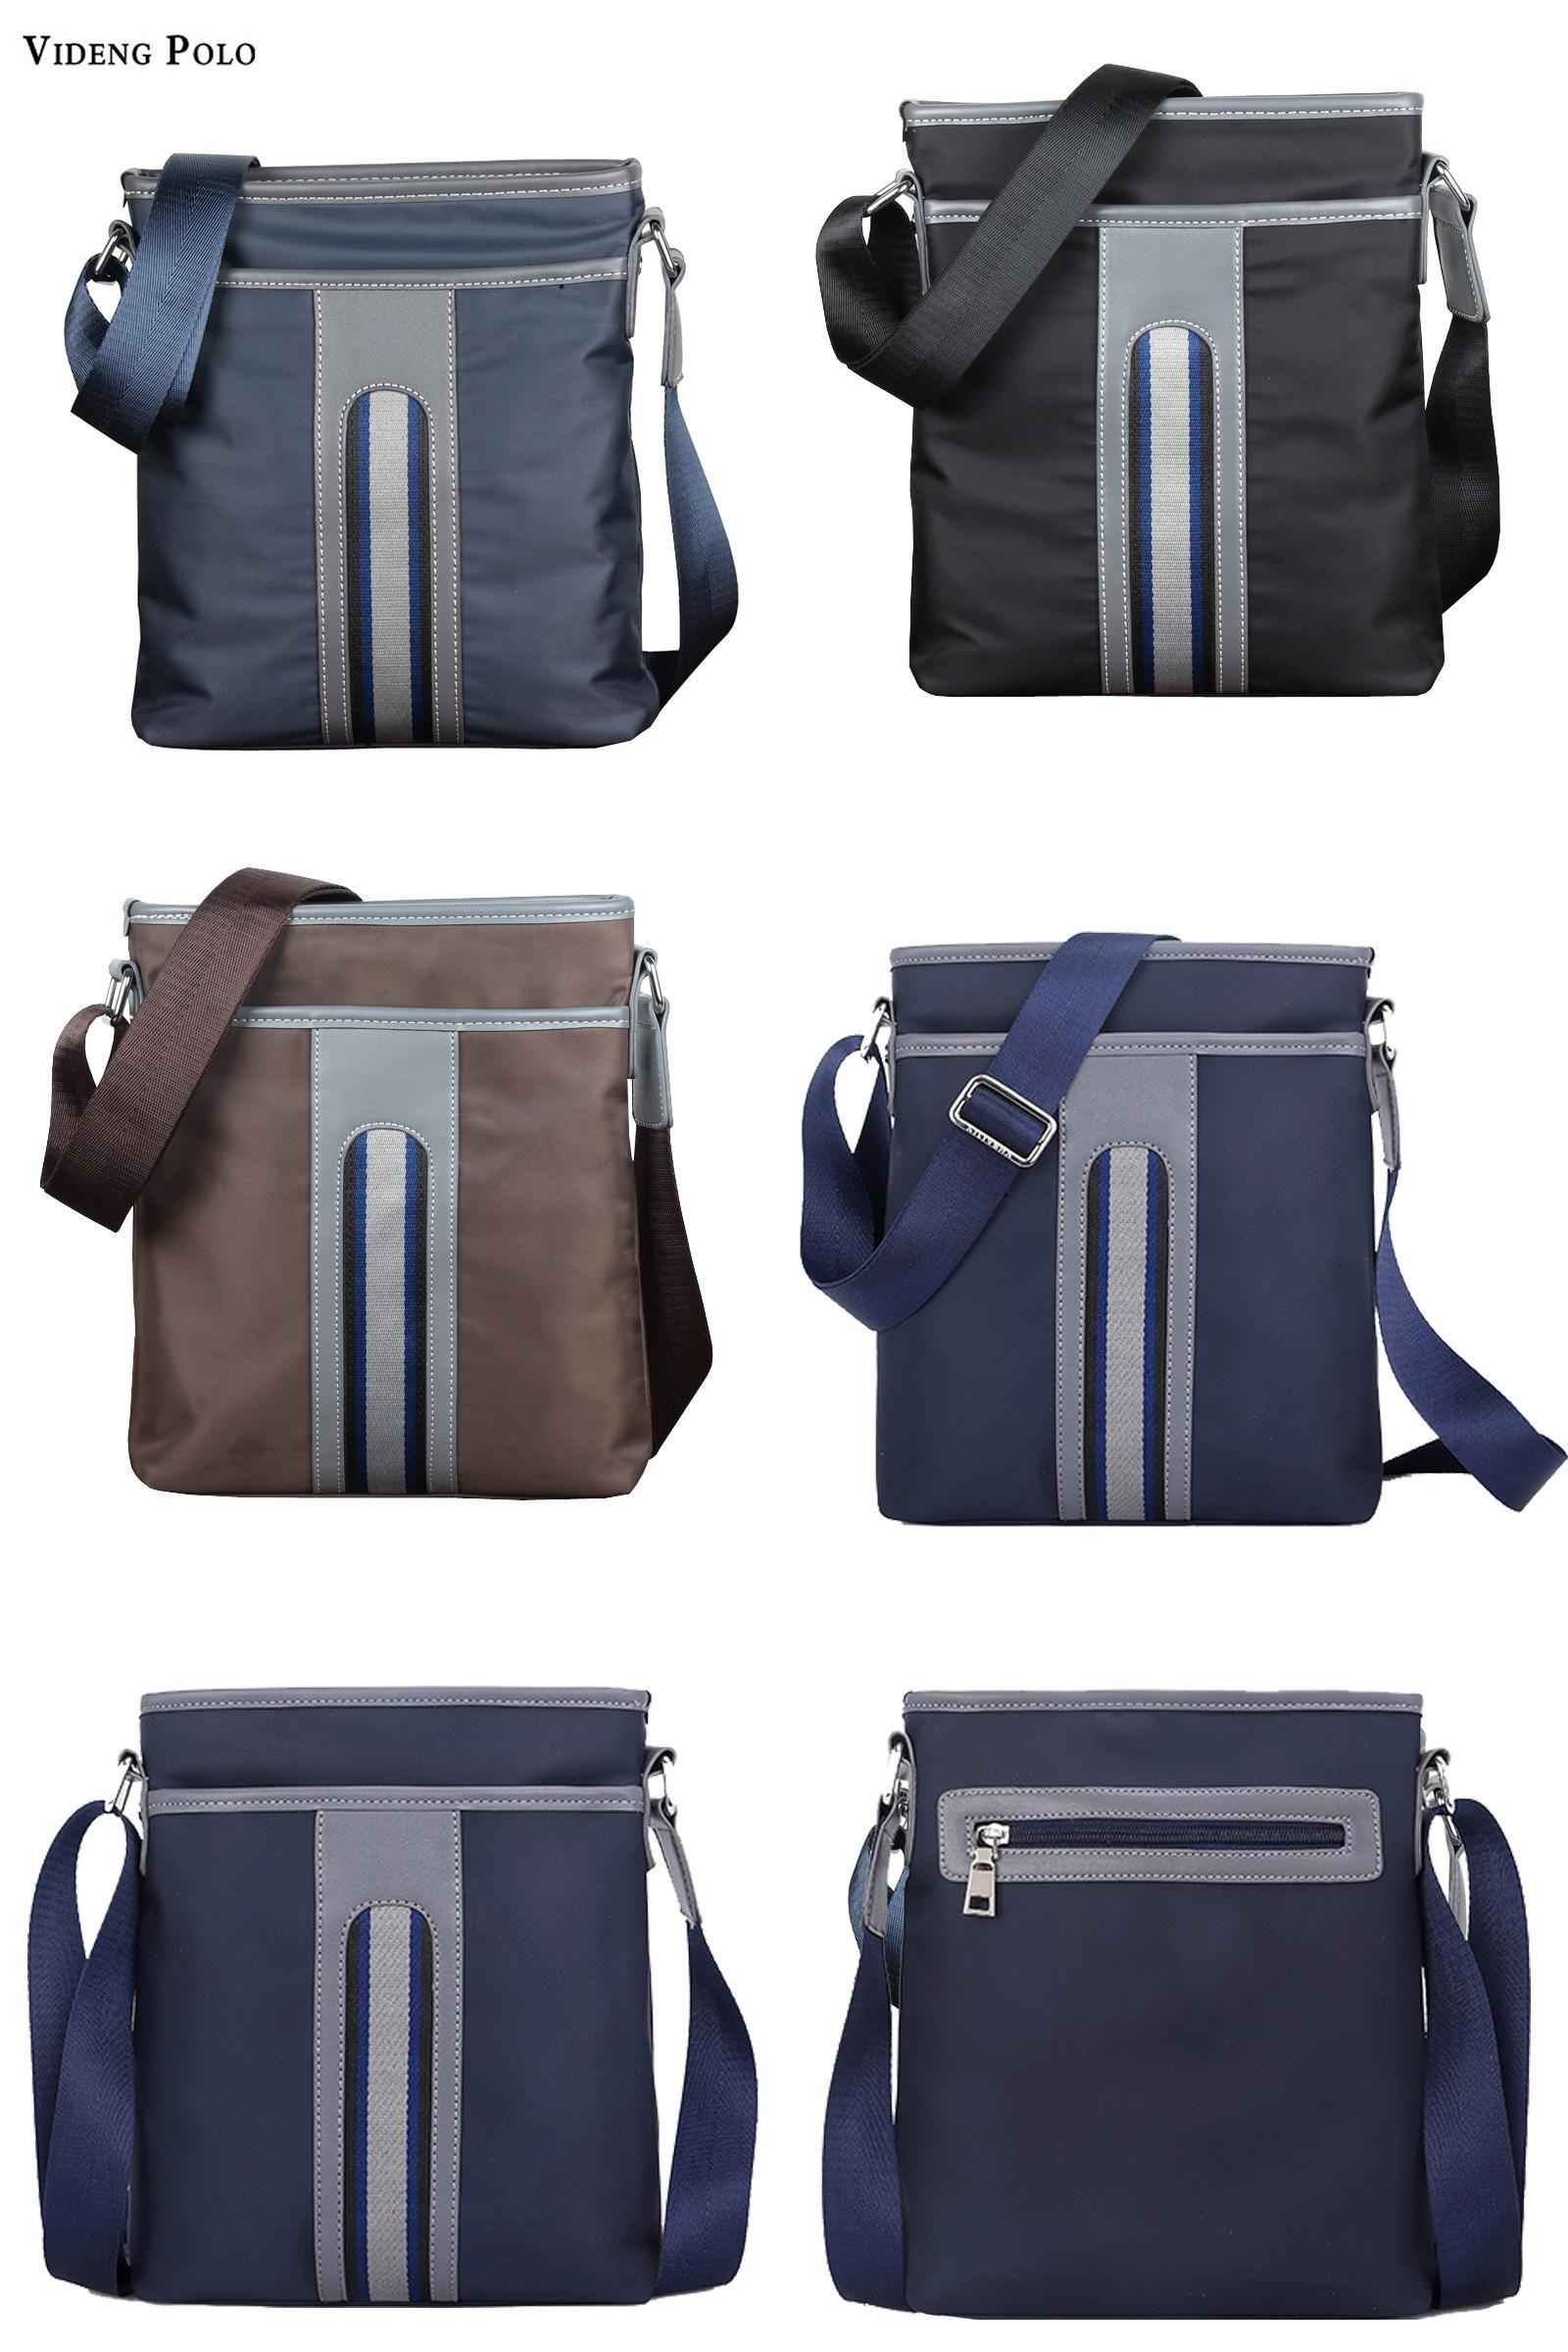 Visit To Buy Videng Polo New Brand Men Messenger Bags Casual Multifunction Small Travel Bags Waterproof Shoulder Military Cros Casual Bags Bags Crossbody Bag